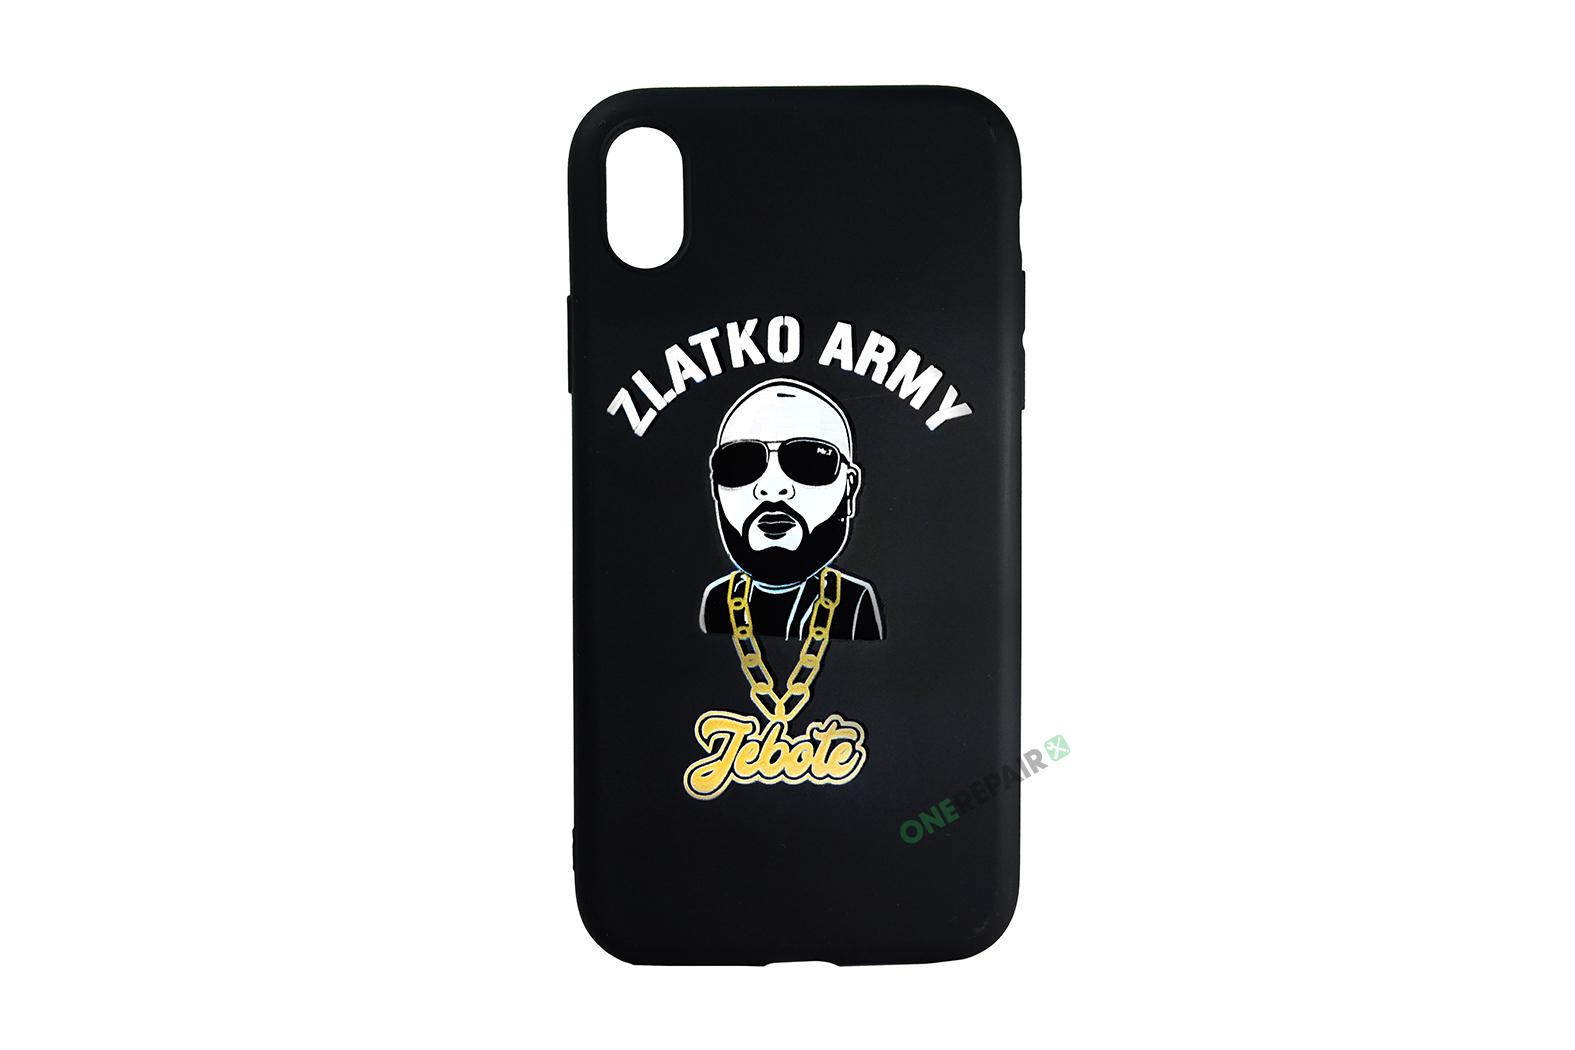 353783-001_iPhone_XR_Zlatko_Army_Sort_OneRepair_00001